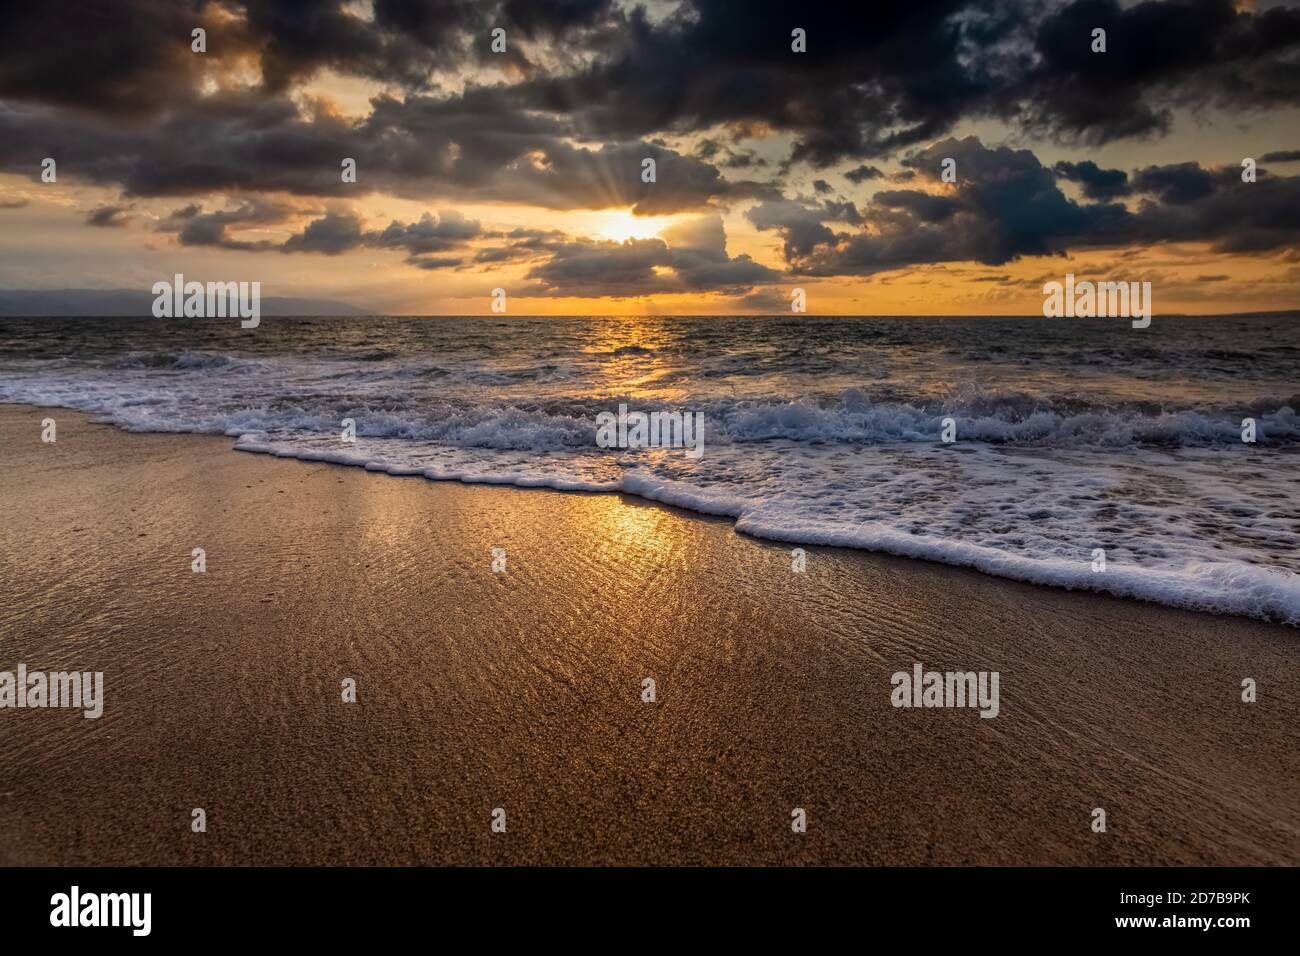 The Sun is Setting on the Ocean Horizon as Sun Rays Burst Through The Clouds Stock Photo